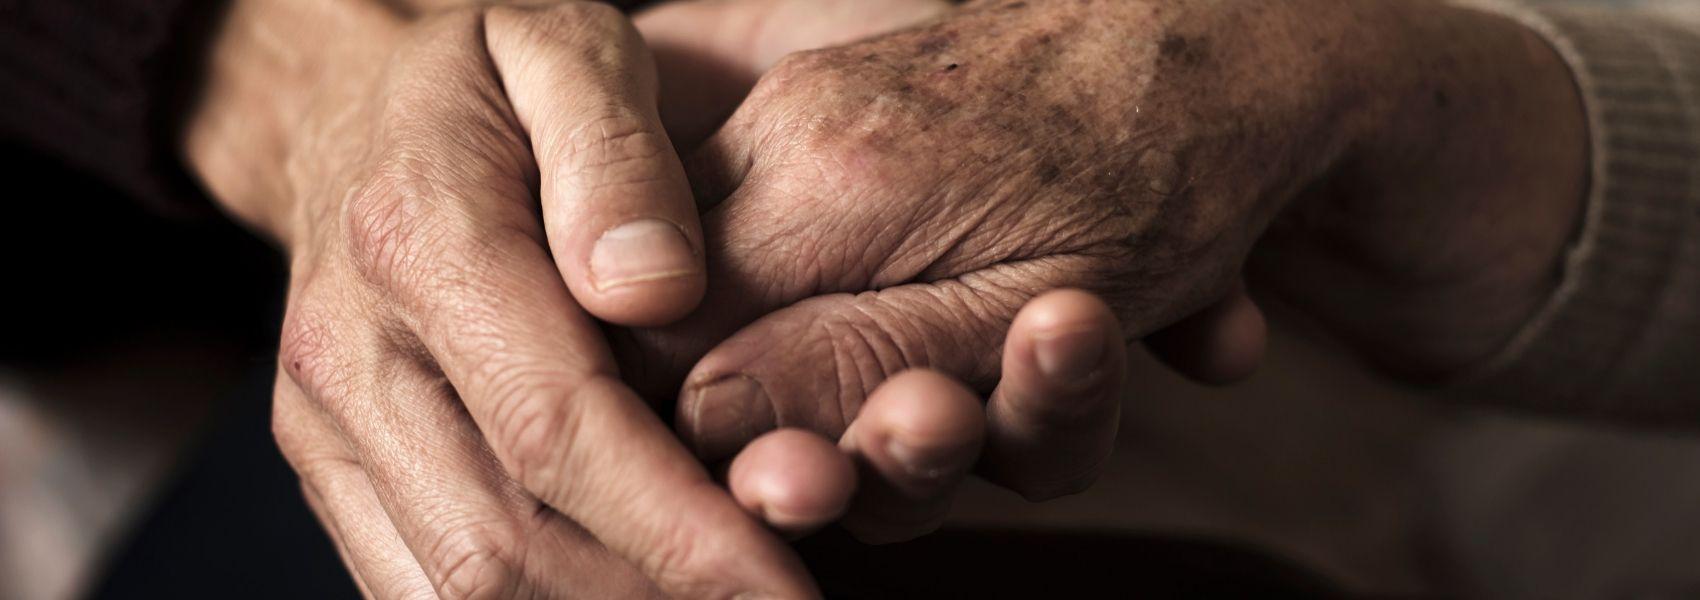 perda auditiva nos idosos